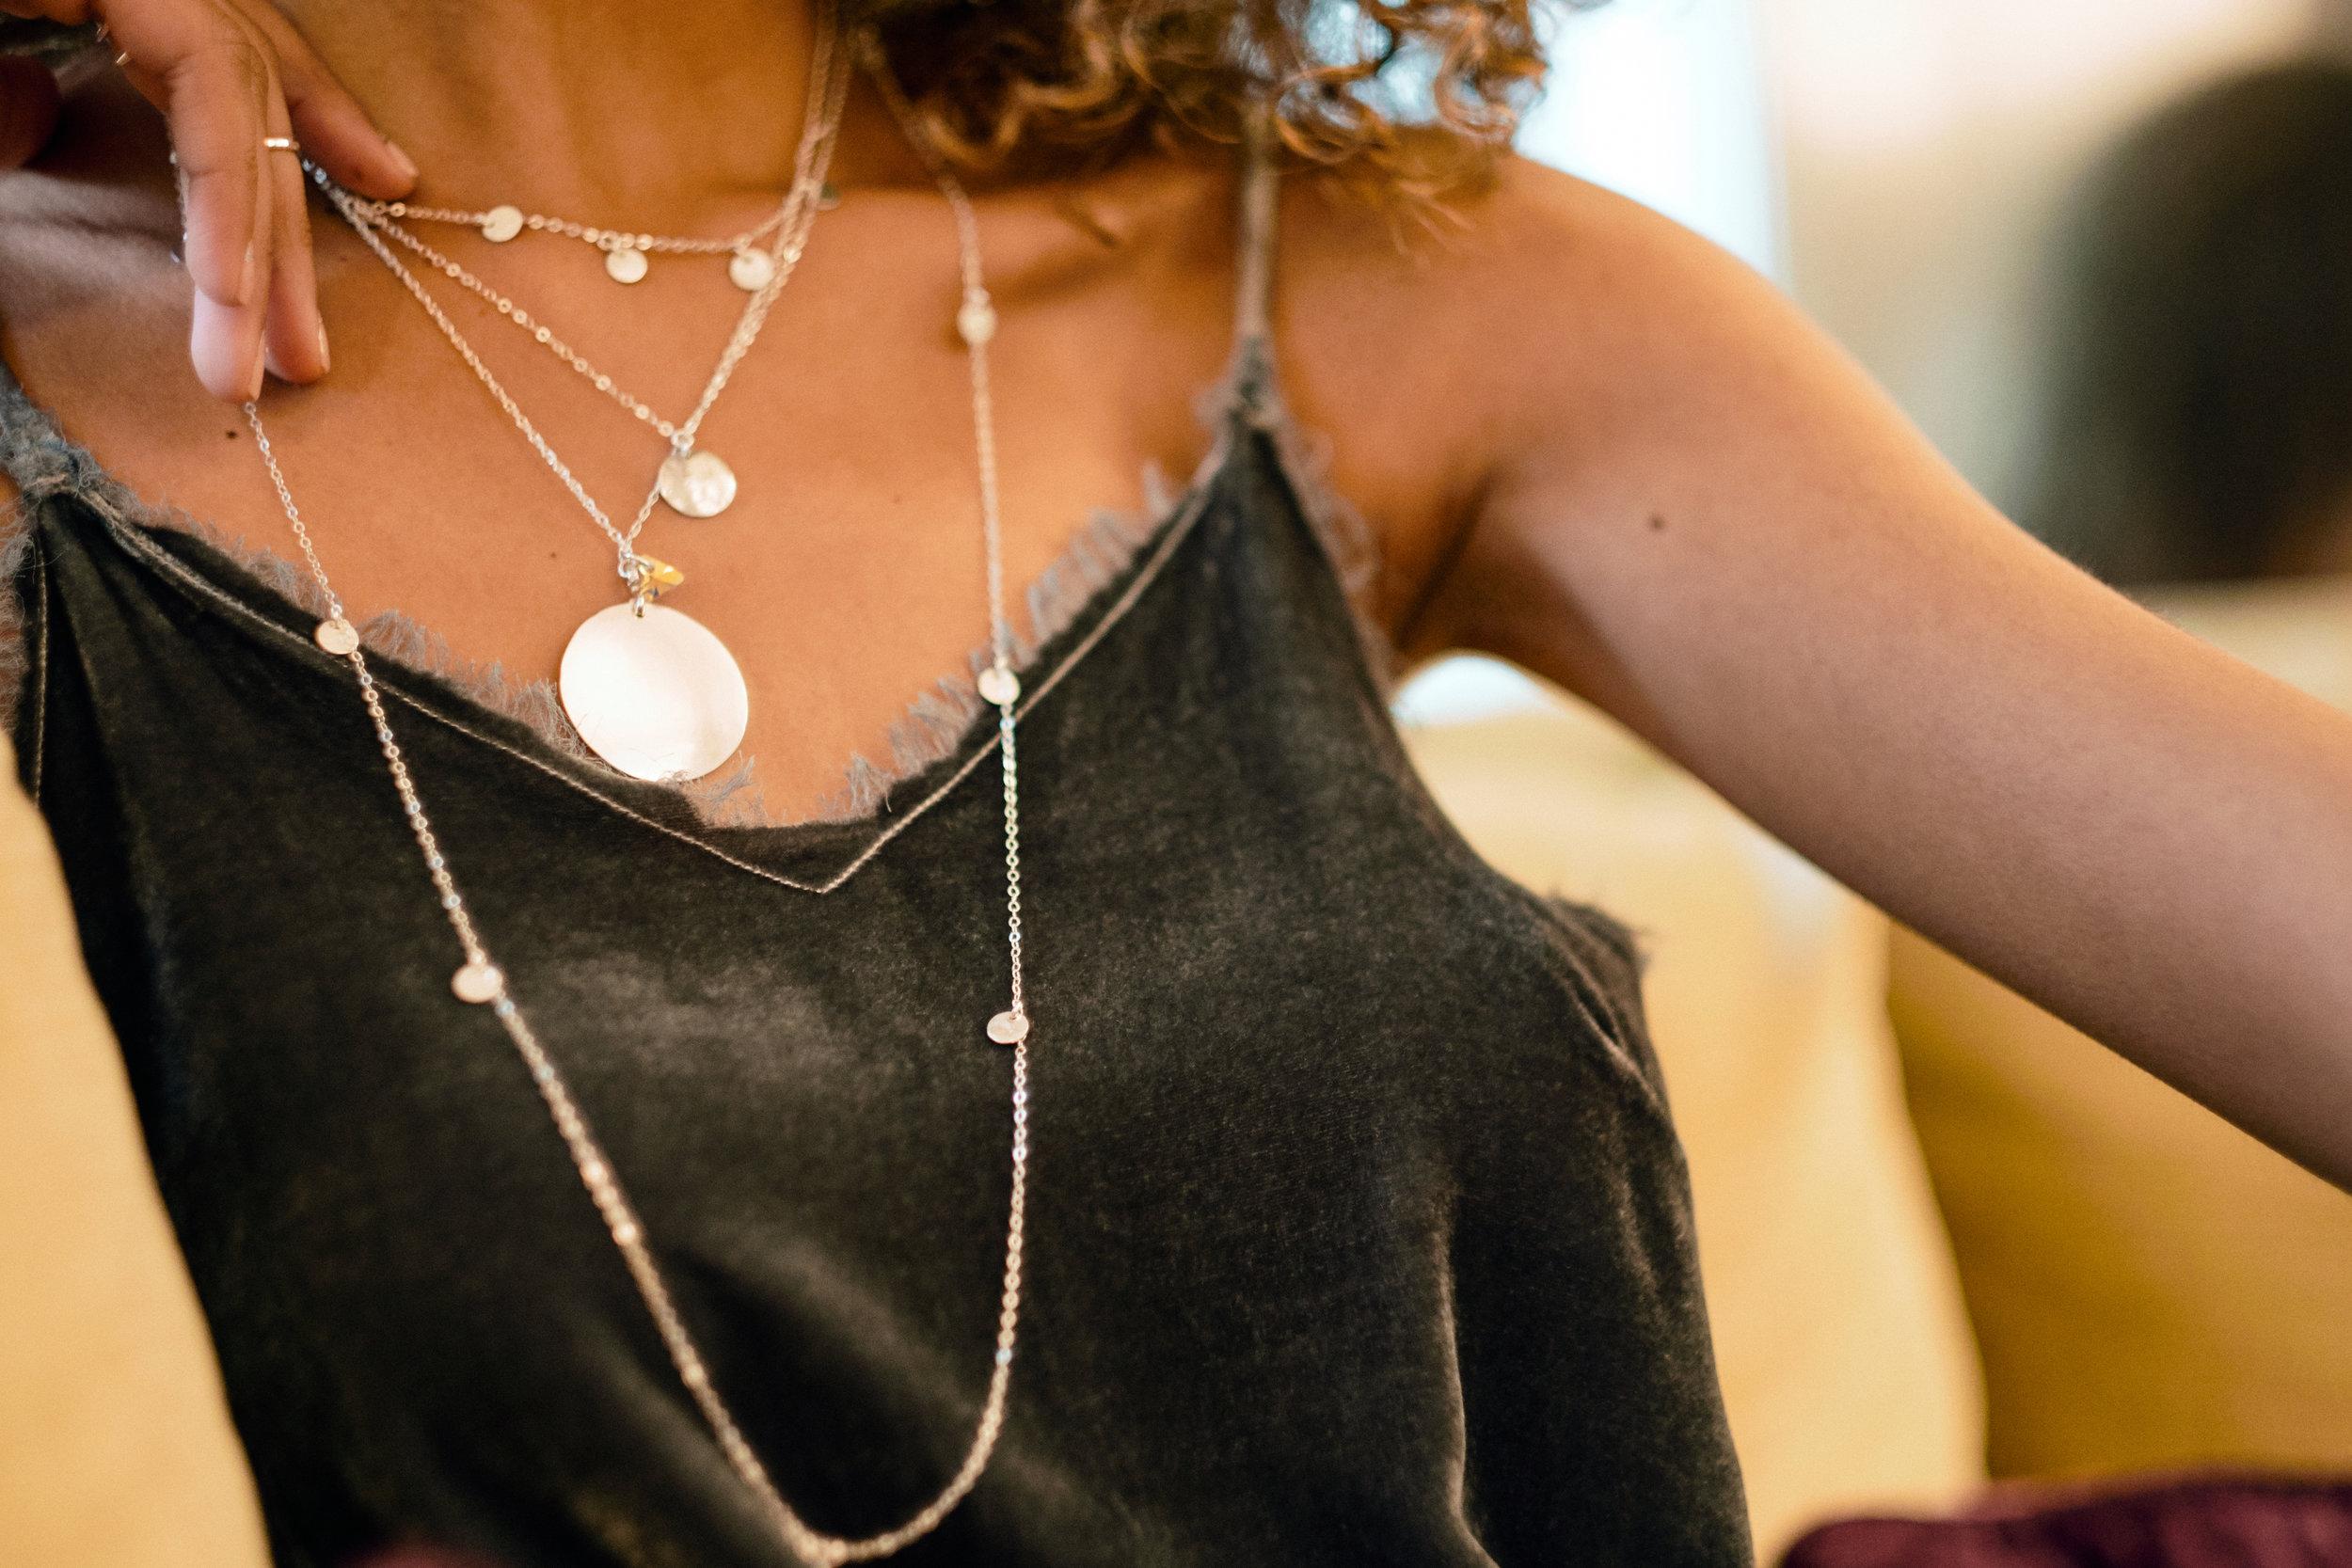 Model wears  Talia Single Disc Necklace ,  Talia 5 Disc Necklace ,  Talia 10 Disc Necklace , and the  Medallion Necklace .